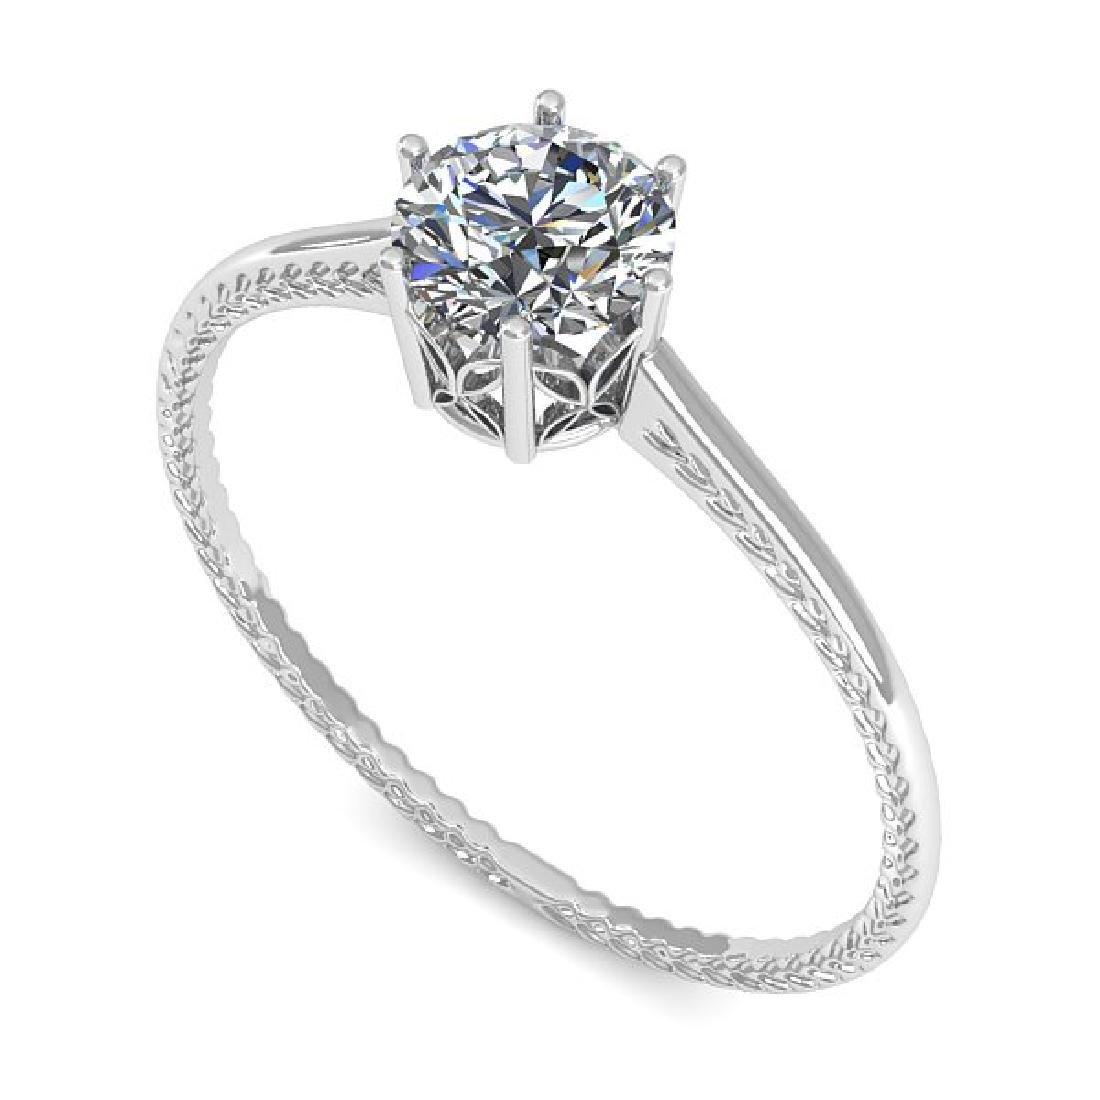 0.50 CTW VS/SI Diamond Art Deco Ring 14K White Gold - 2